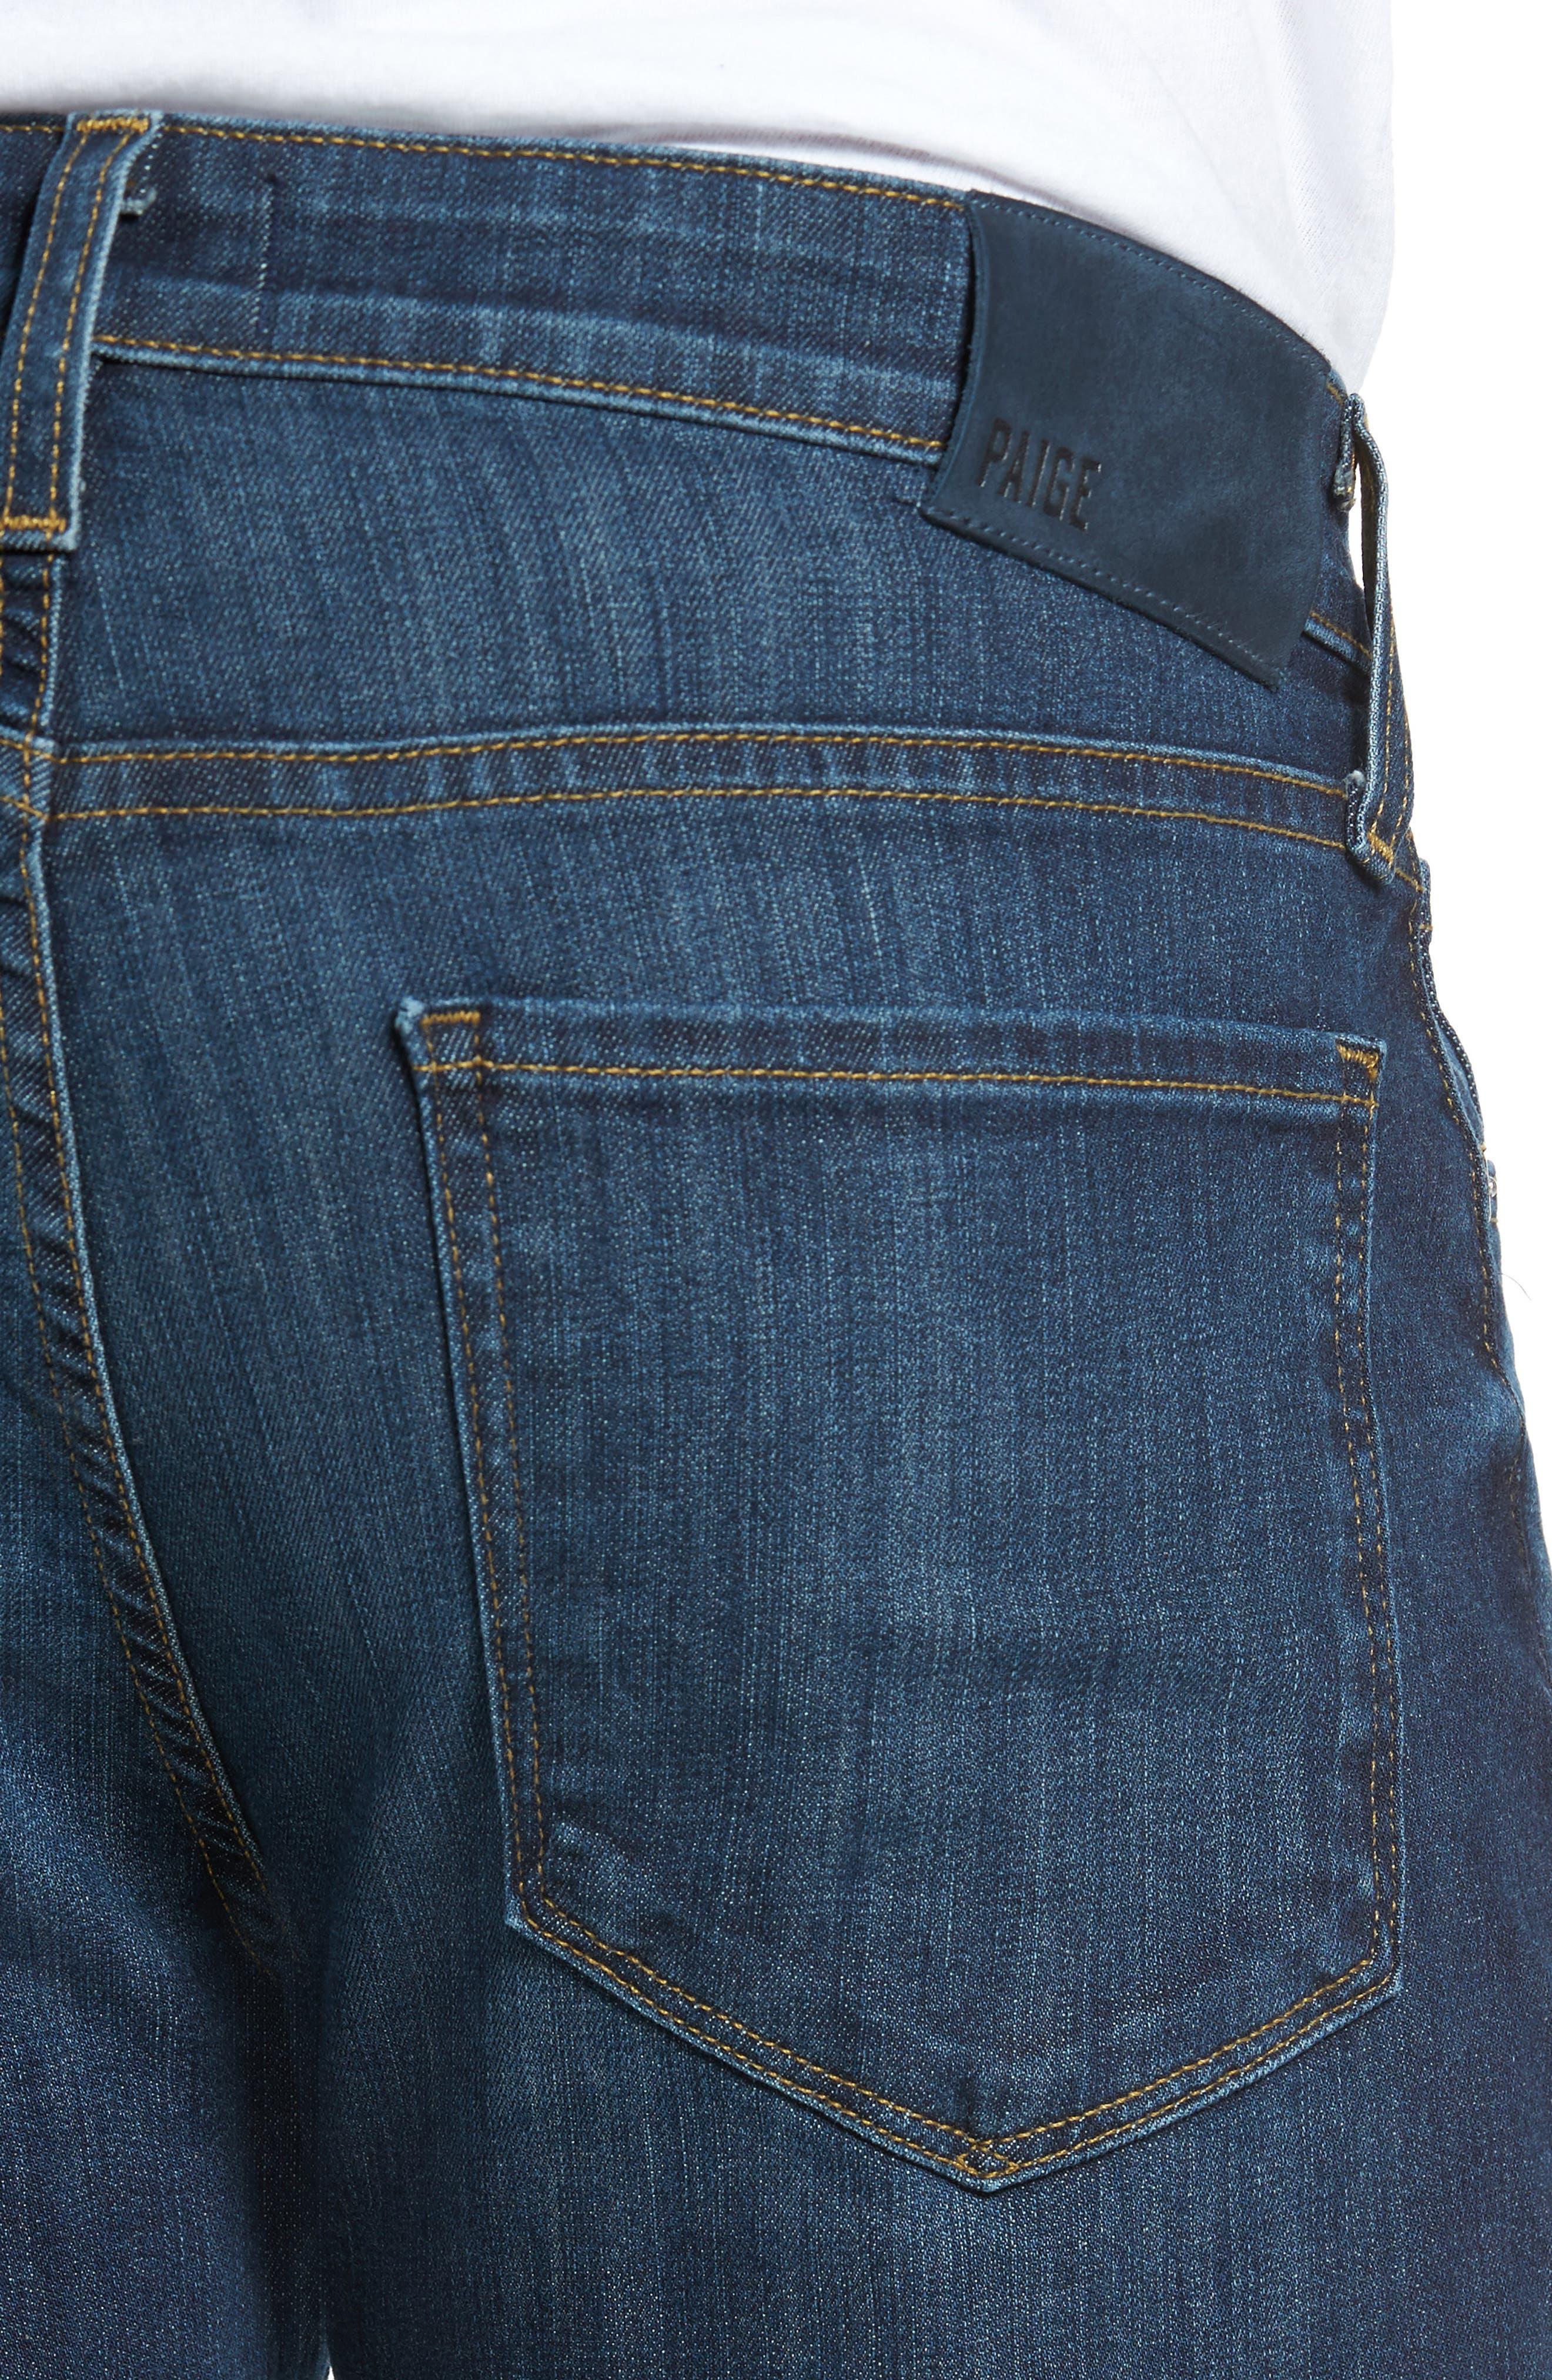 Lennox Slim Fit Jeans,                             Alternate thumbnail 4, color,                             400